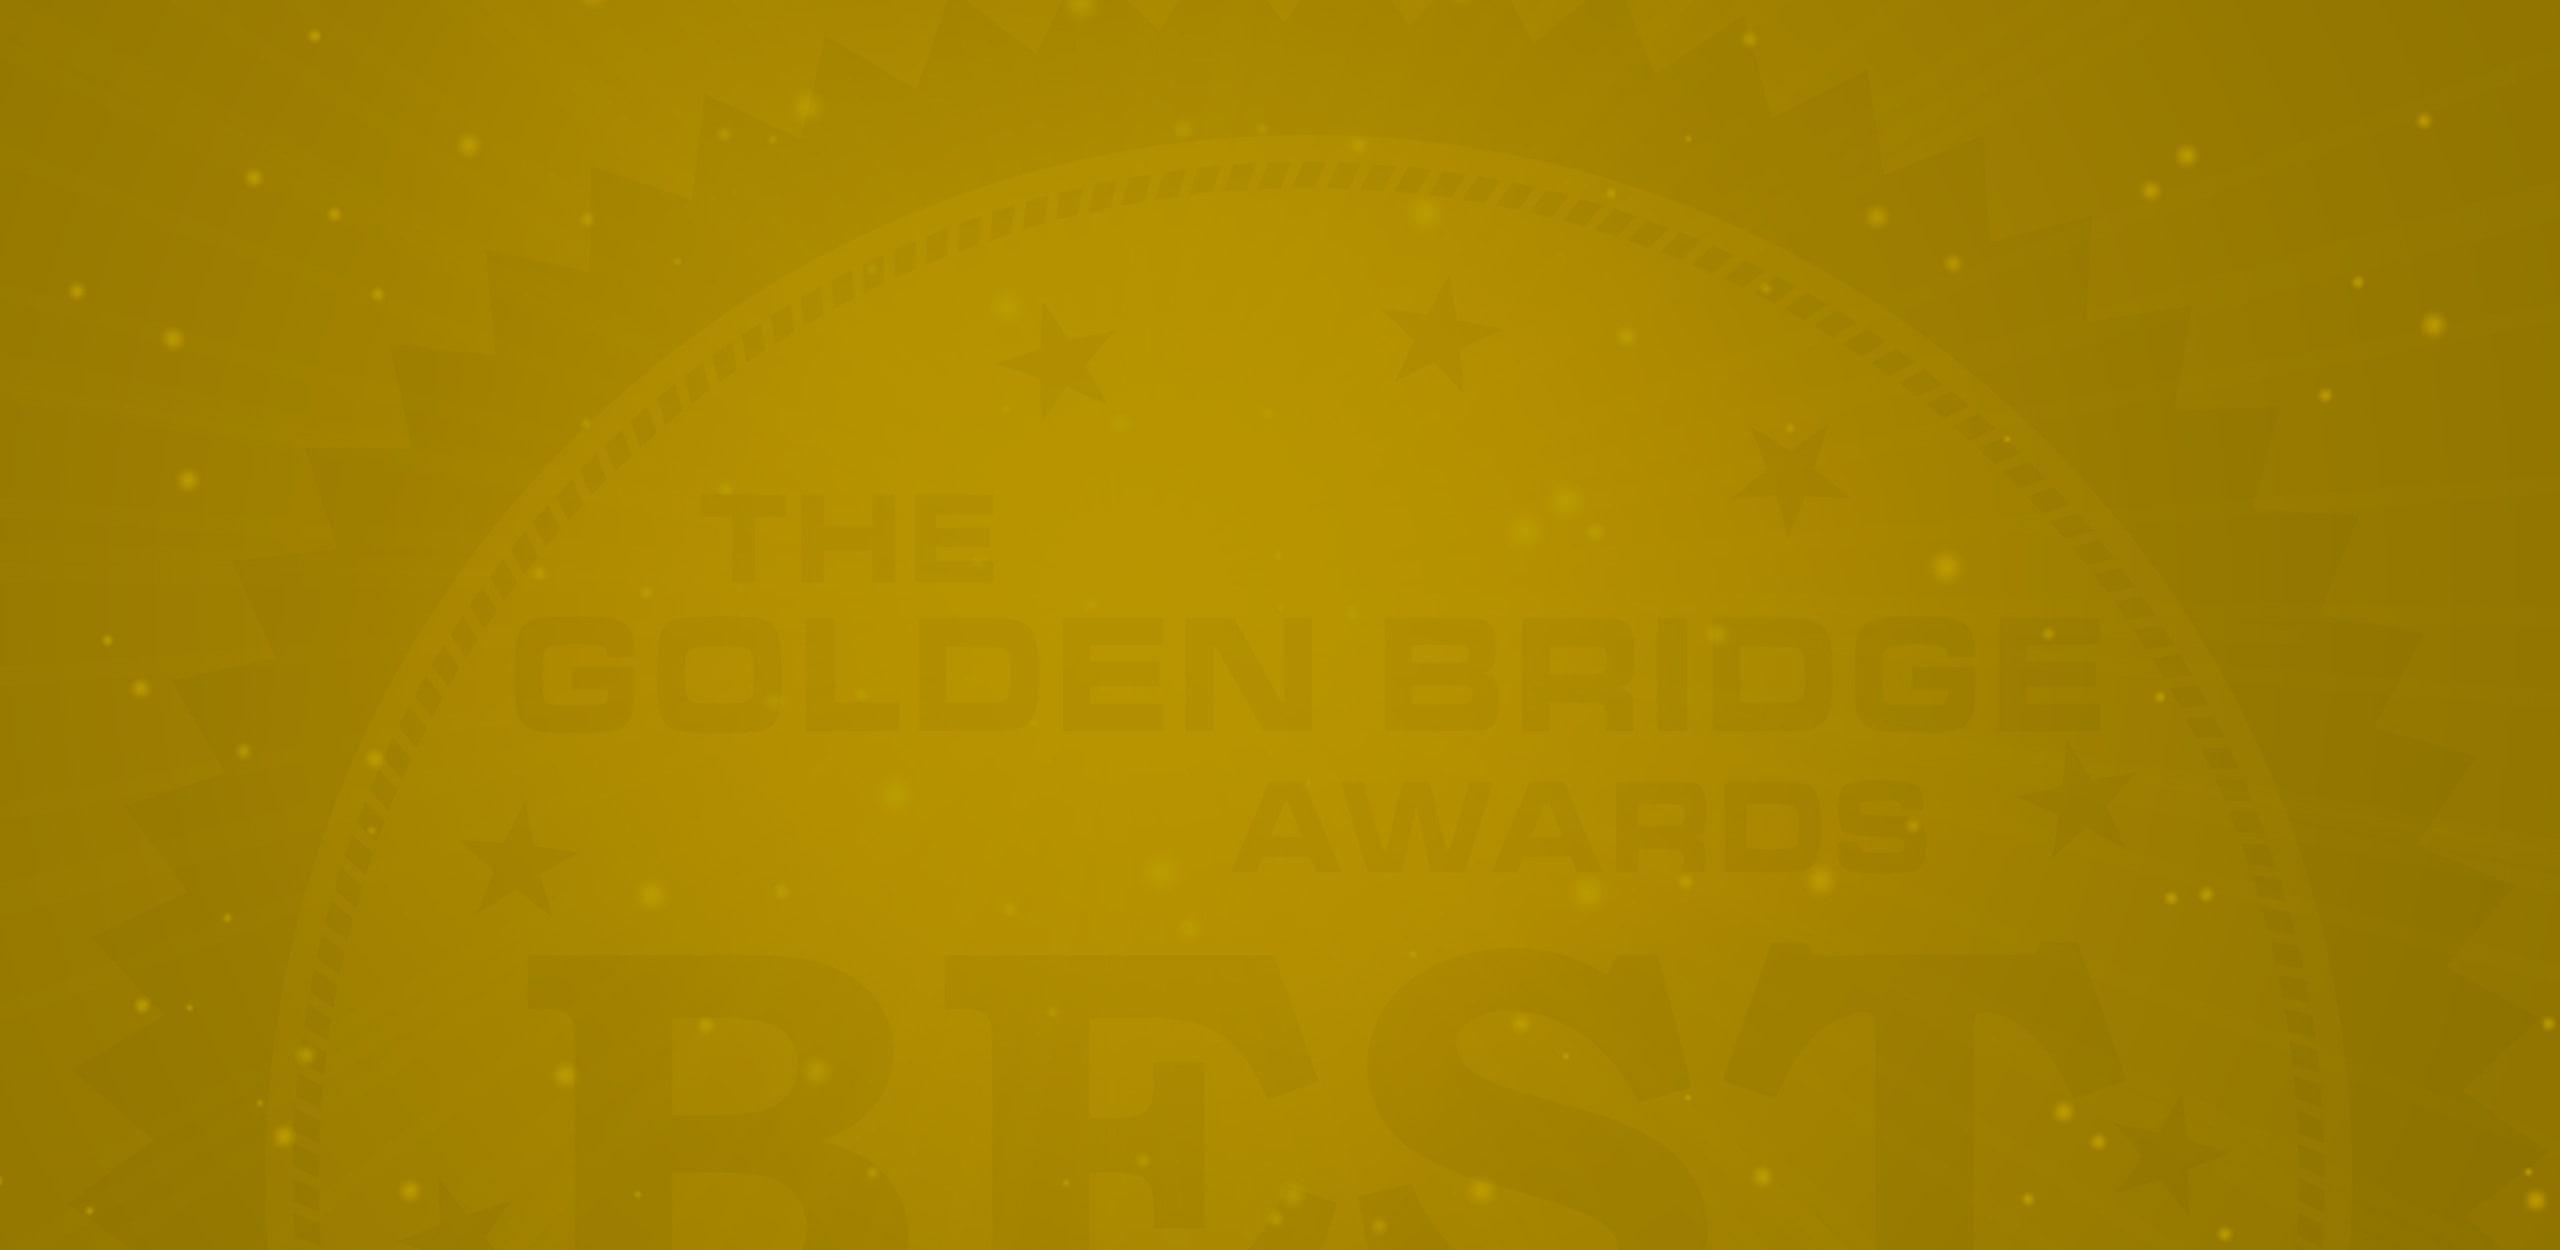 vyvo Golden Bridge Business and Innovation Awards